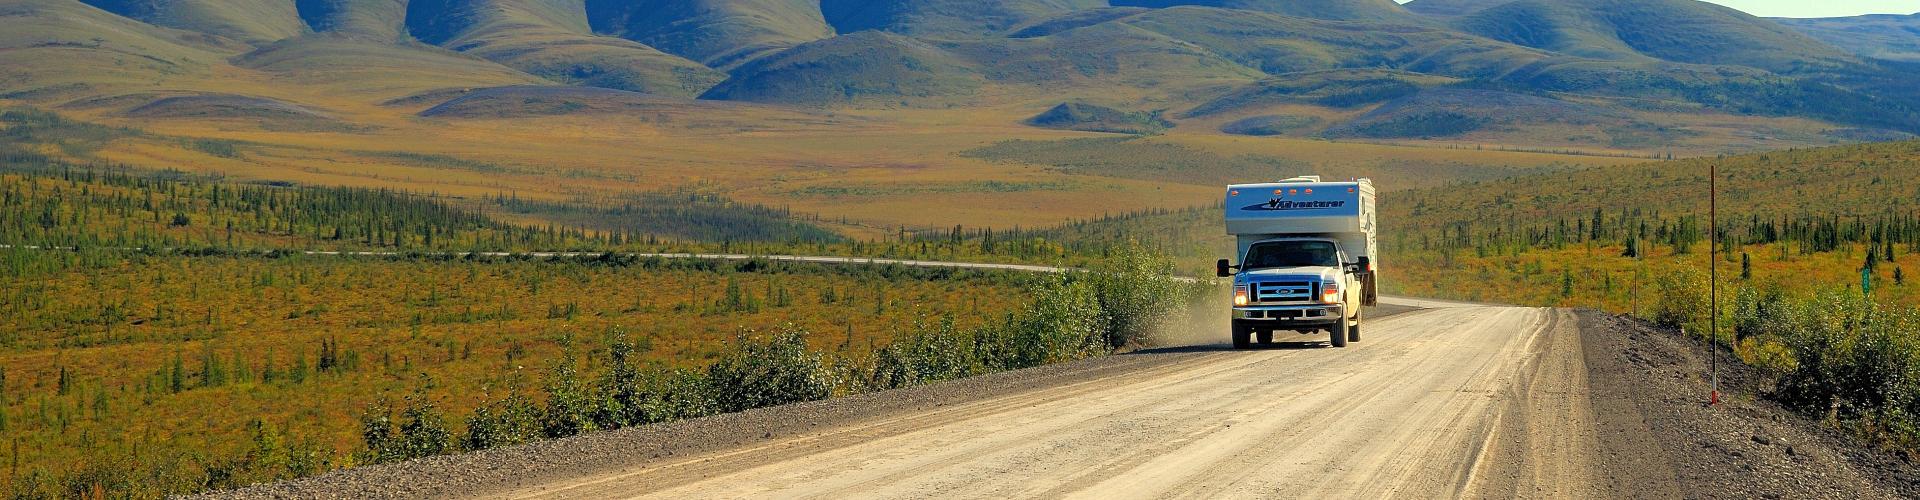 Dempster Highway, Alaska